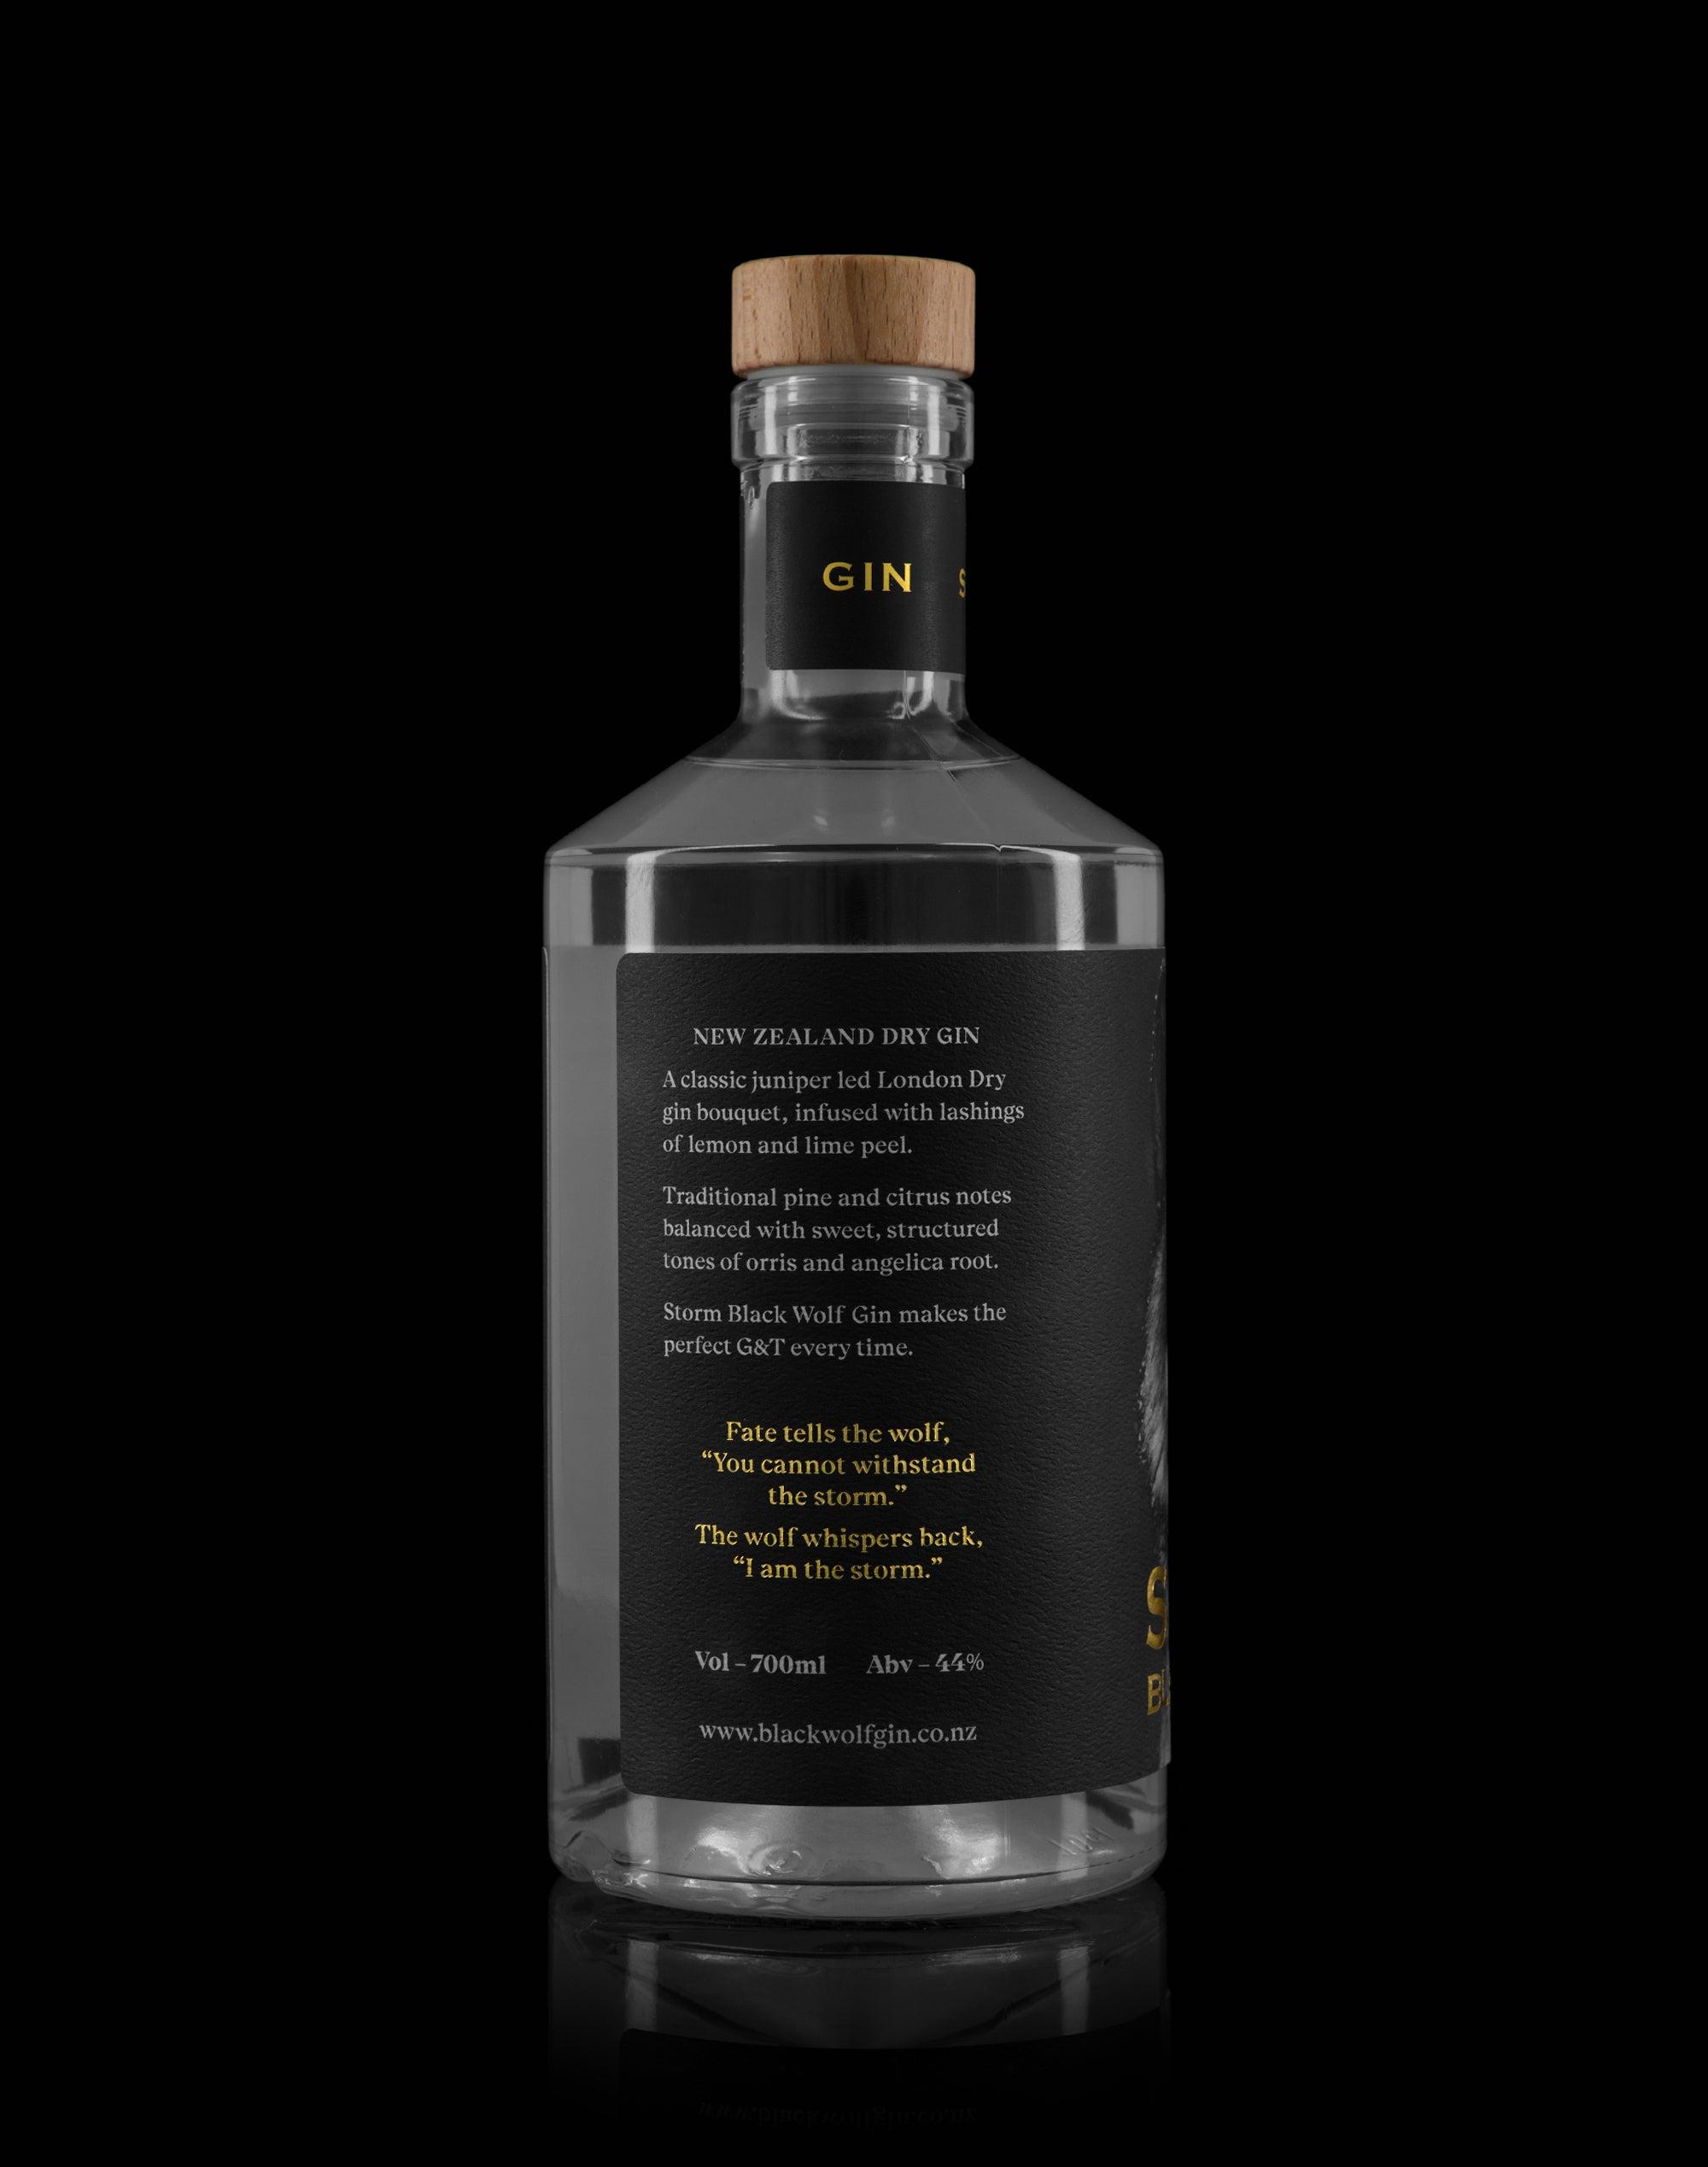 Storm Black Wolf Gin